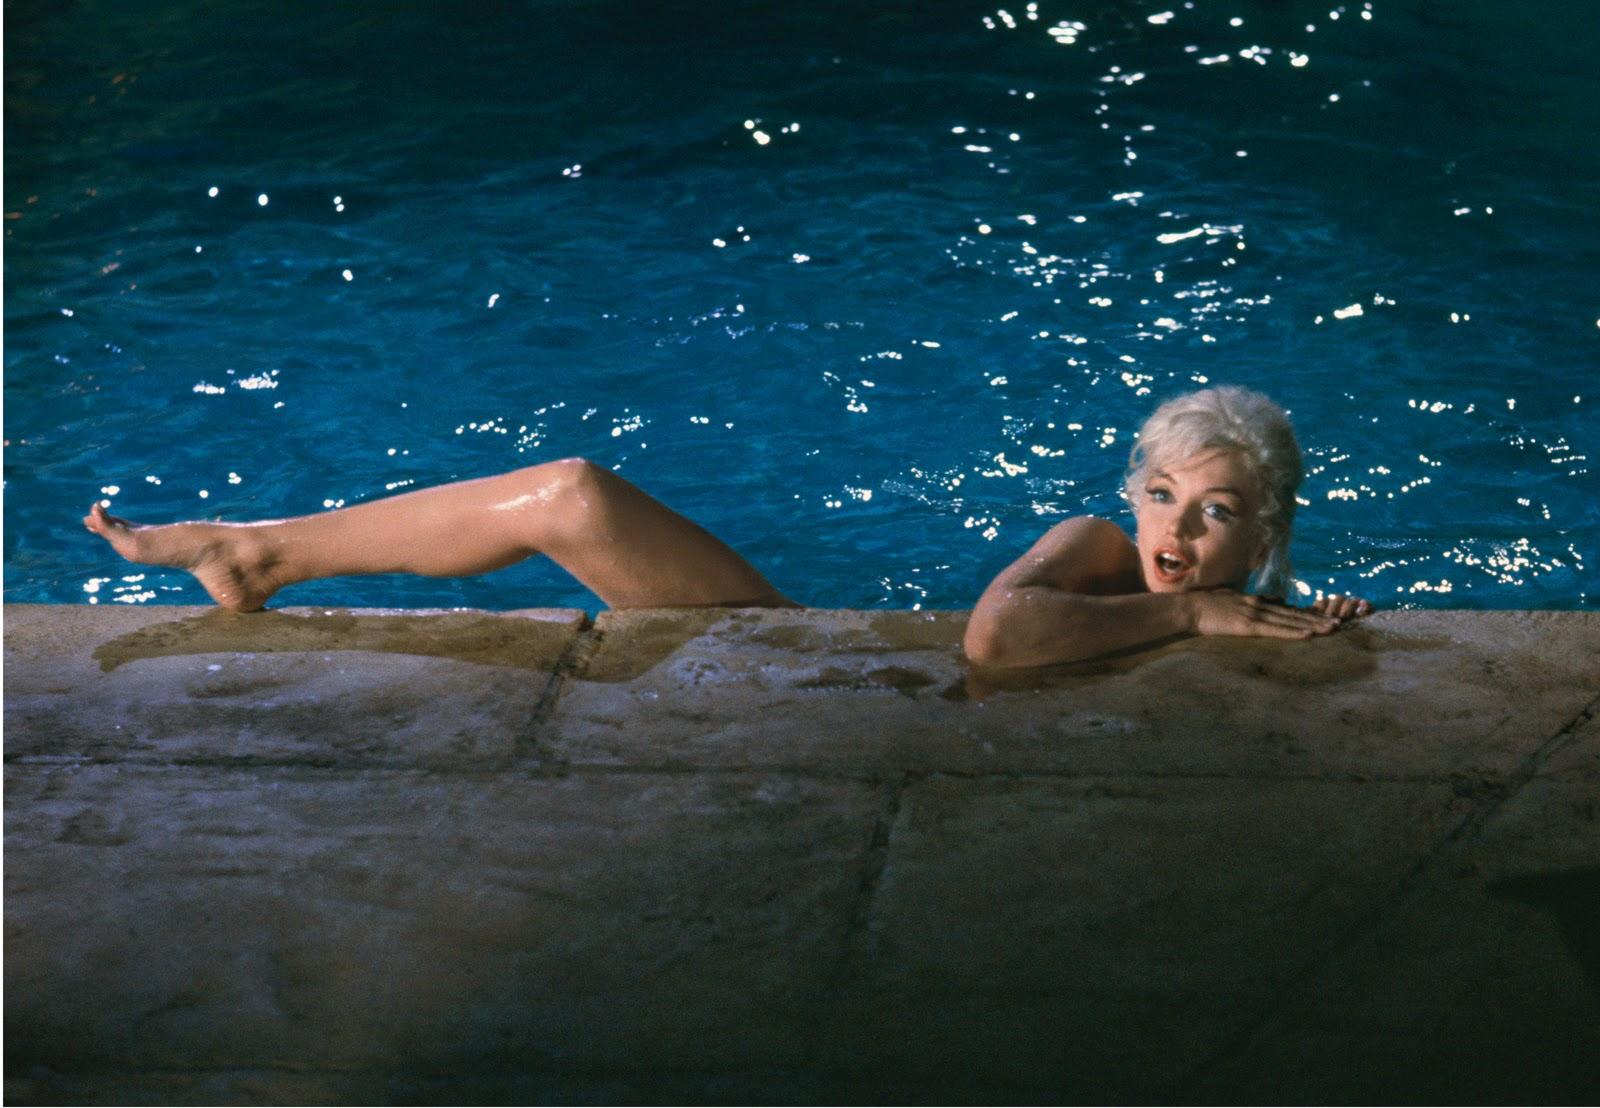 http://3.bp.blogspot.com/-9gx0lkzIPVY/TyHxBqADiHI/AAAAAAAAI-8/mTgNi-2Ftnc/s1600/Schiller_Marilyn+Monroe+(color)+HIGH+RES.jpg